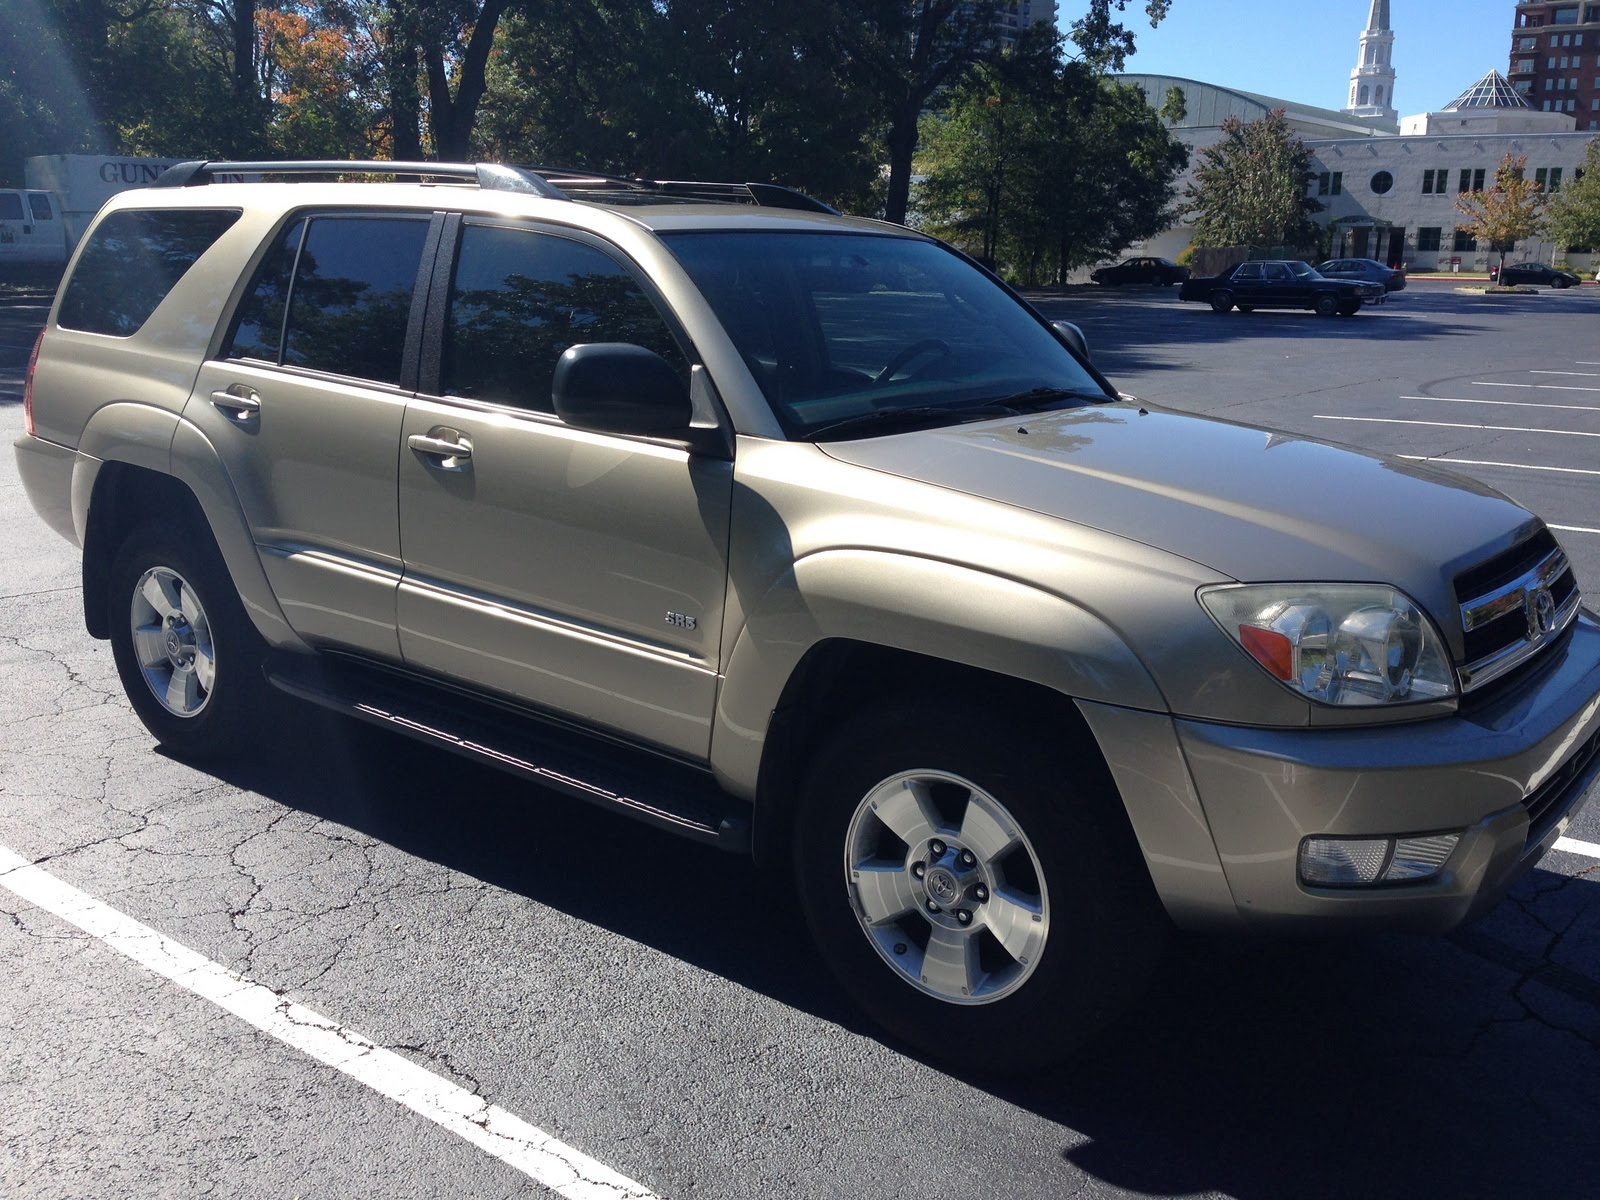 Used Toyota 4Runner For Sale Atlanta, GA - CarGurus